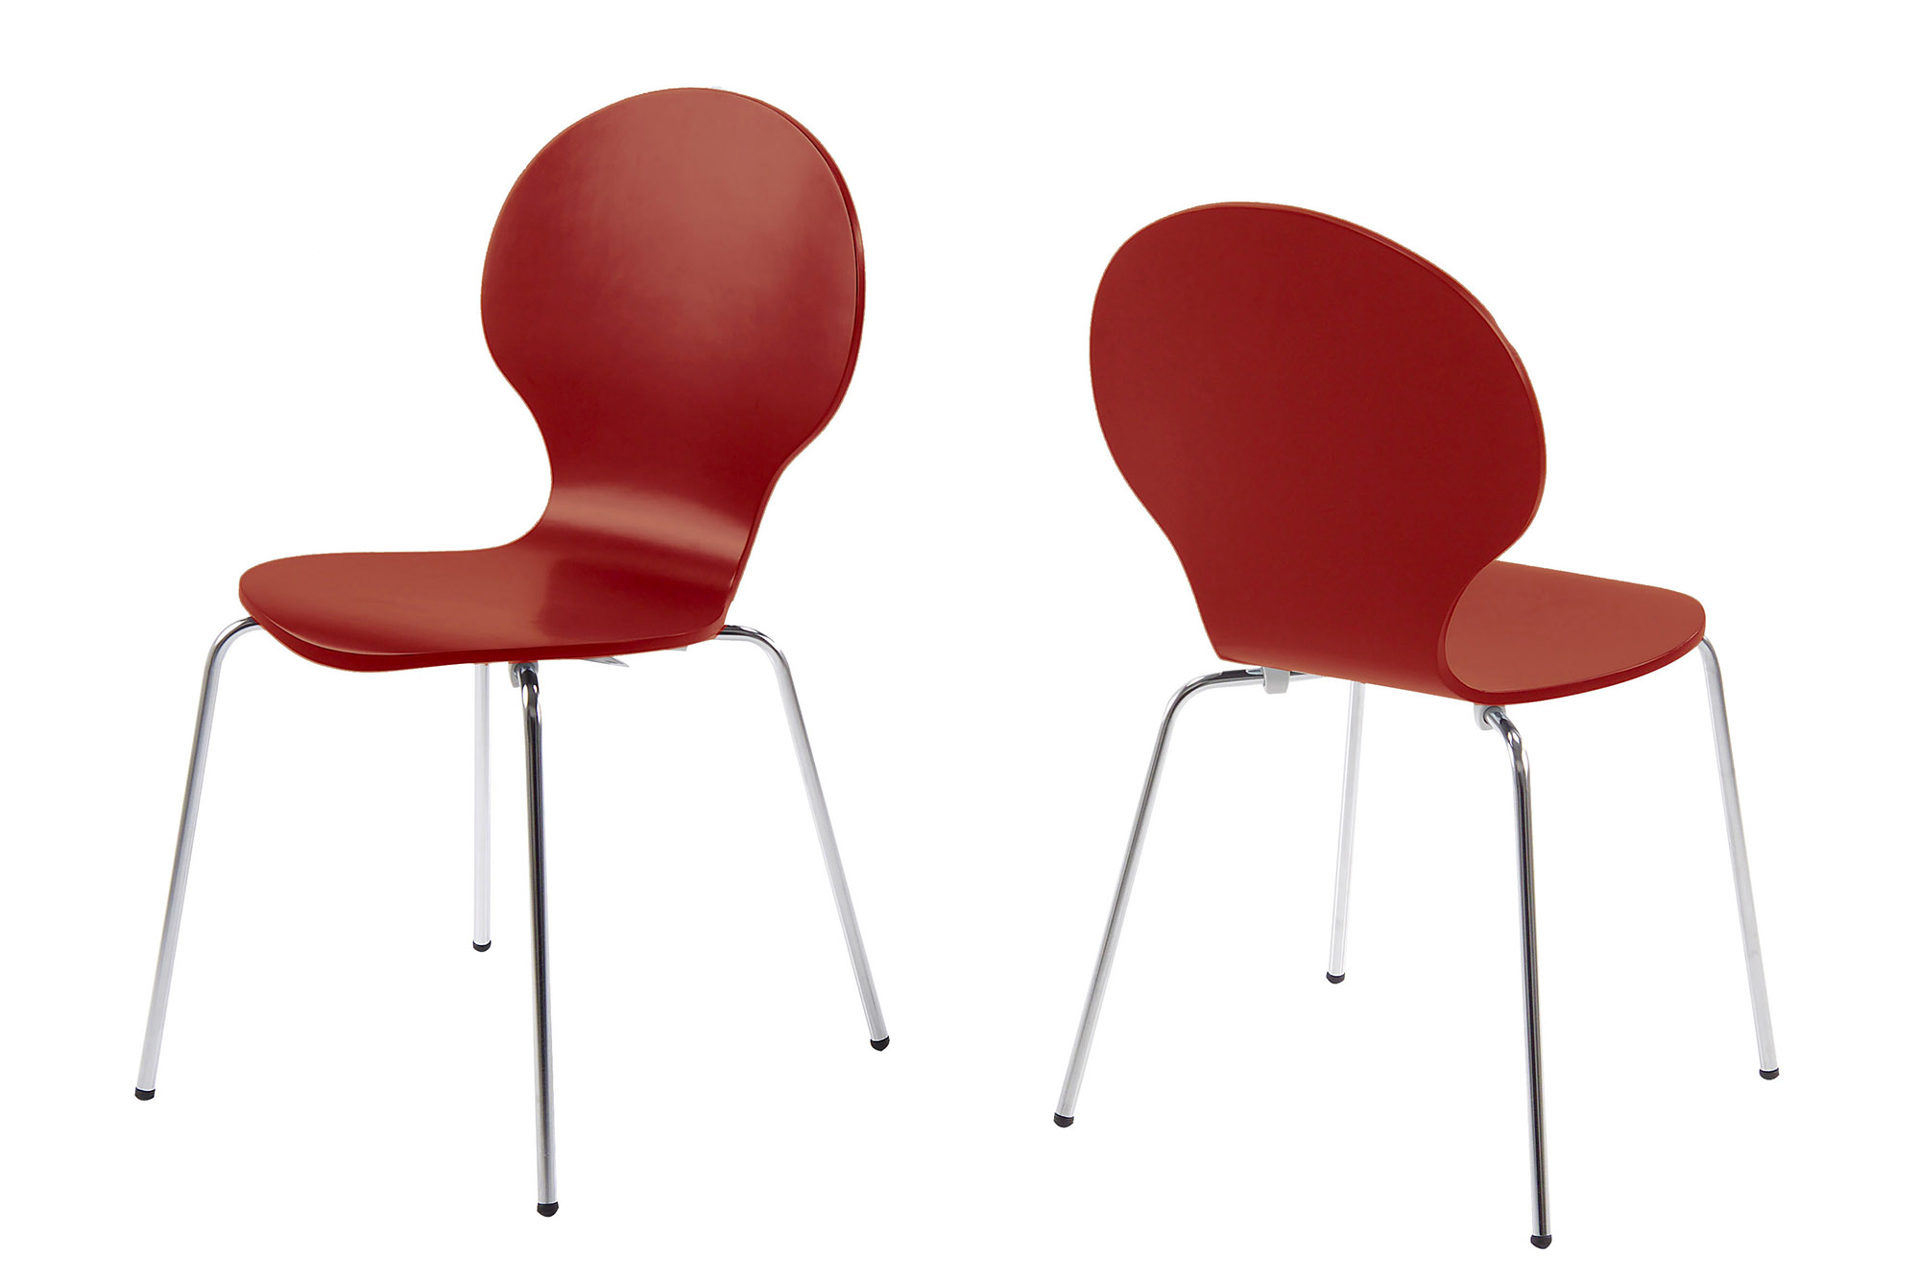 Stapelstuhl auch für Sitzgruppen geeignet, dunkelrot lackierte, Bad ...